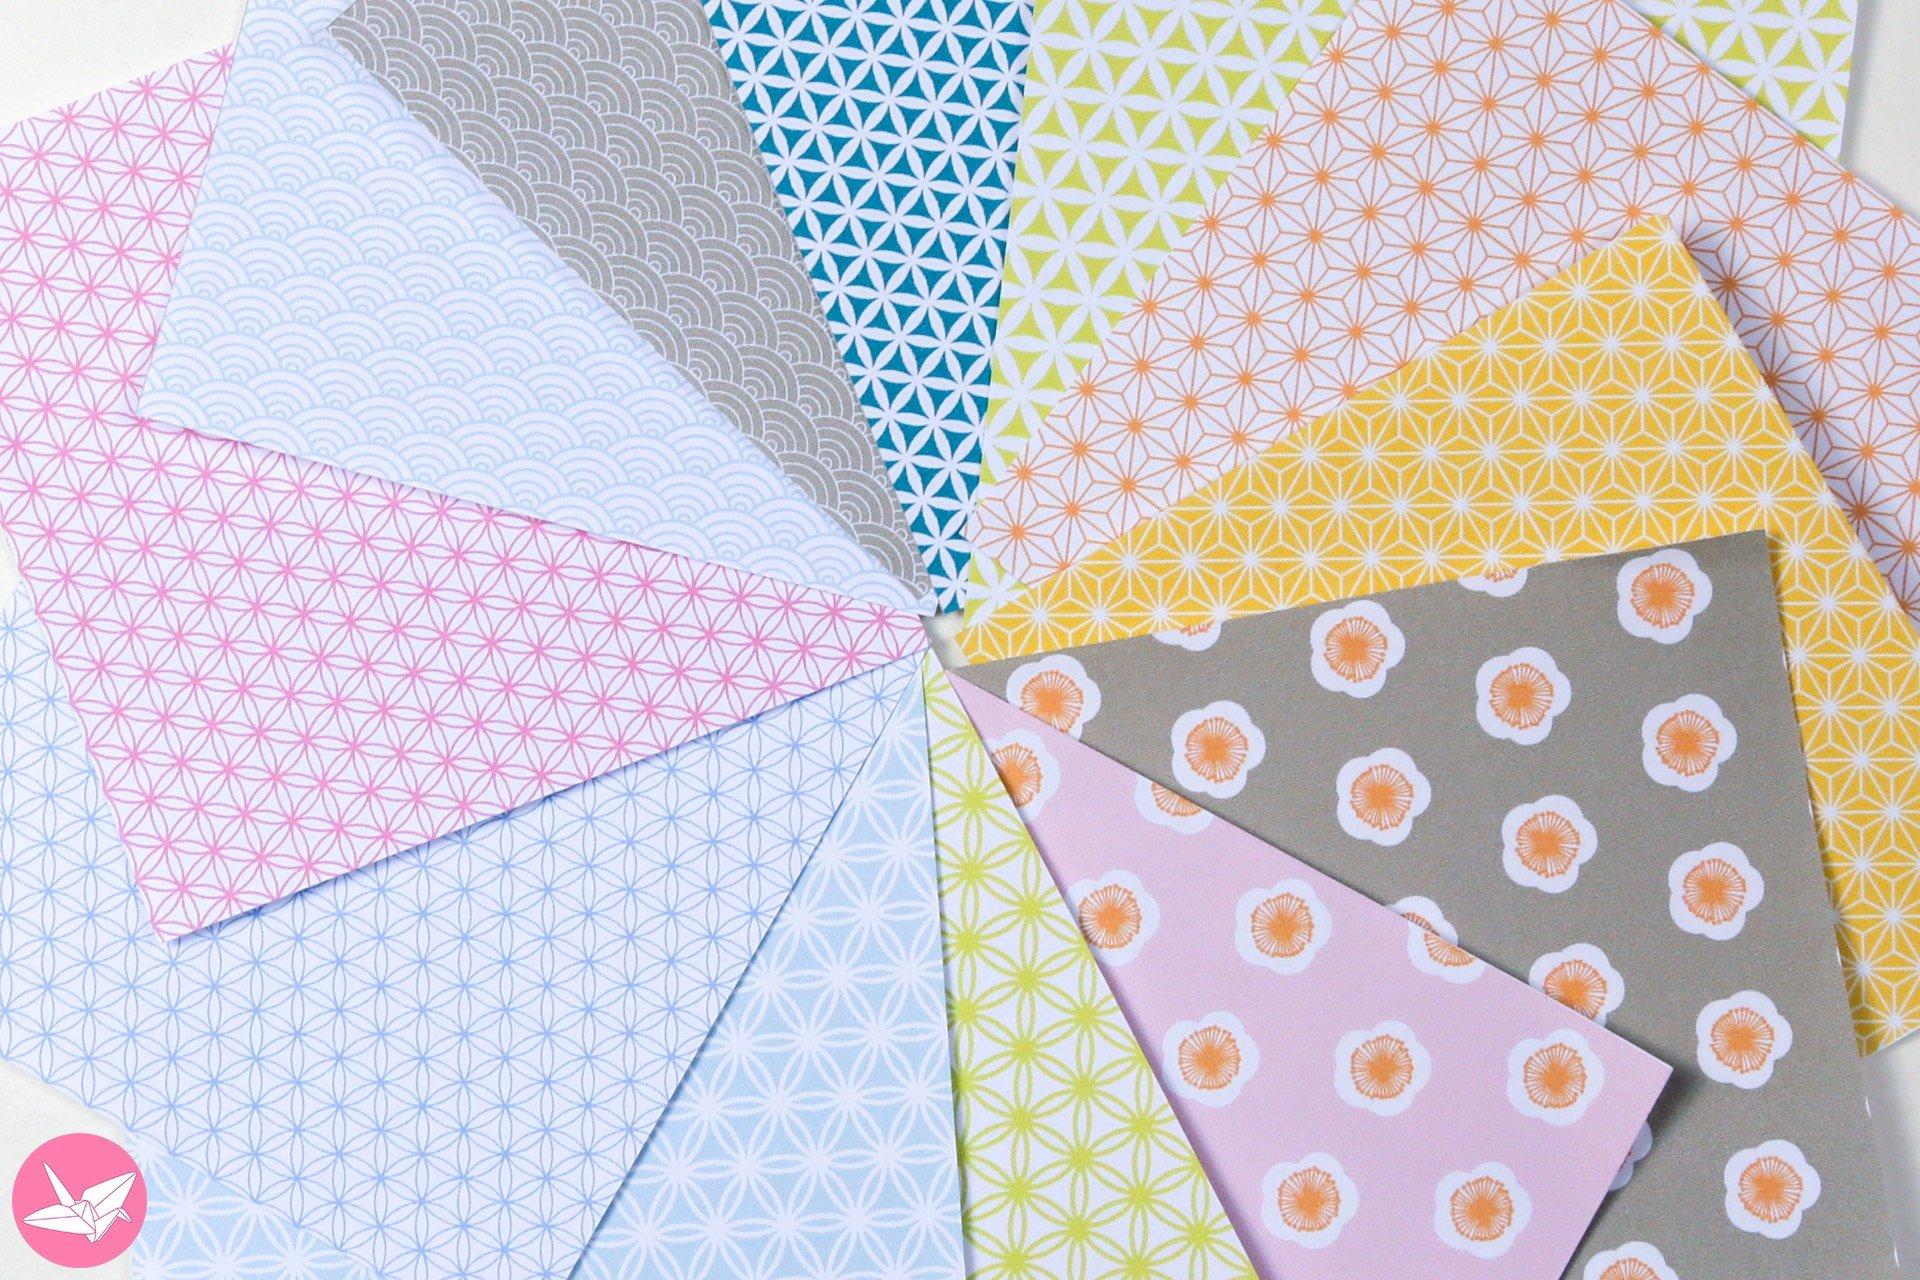 Japanese Origami Paper Printable Pack - Paper Kawaii Shop - photo#23